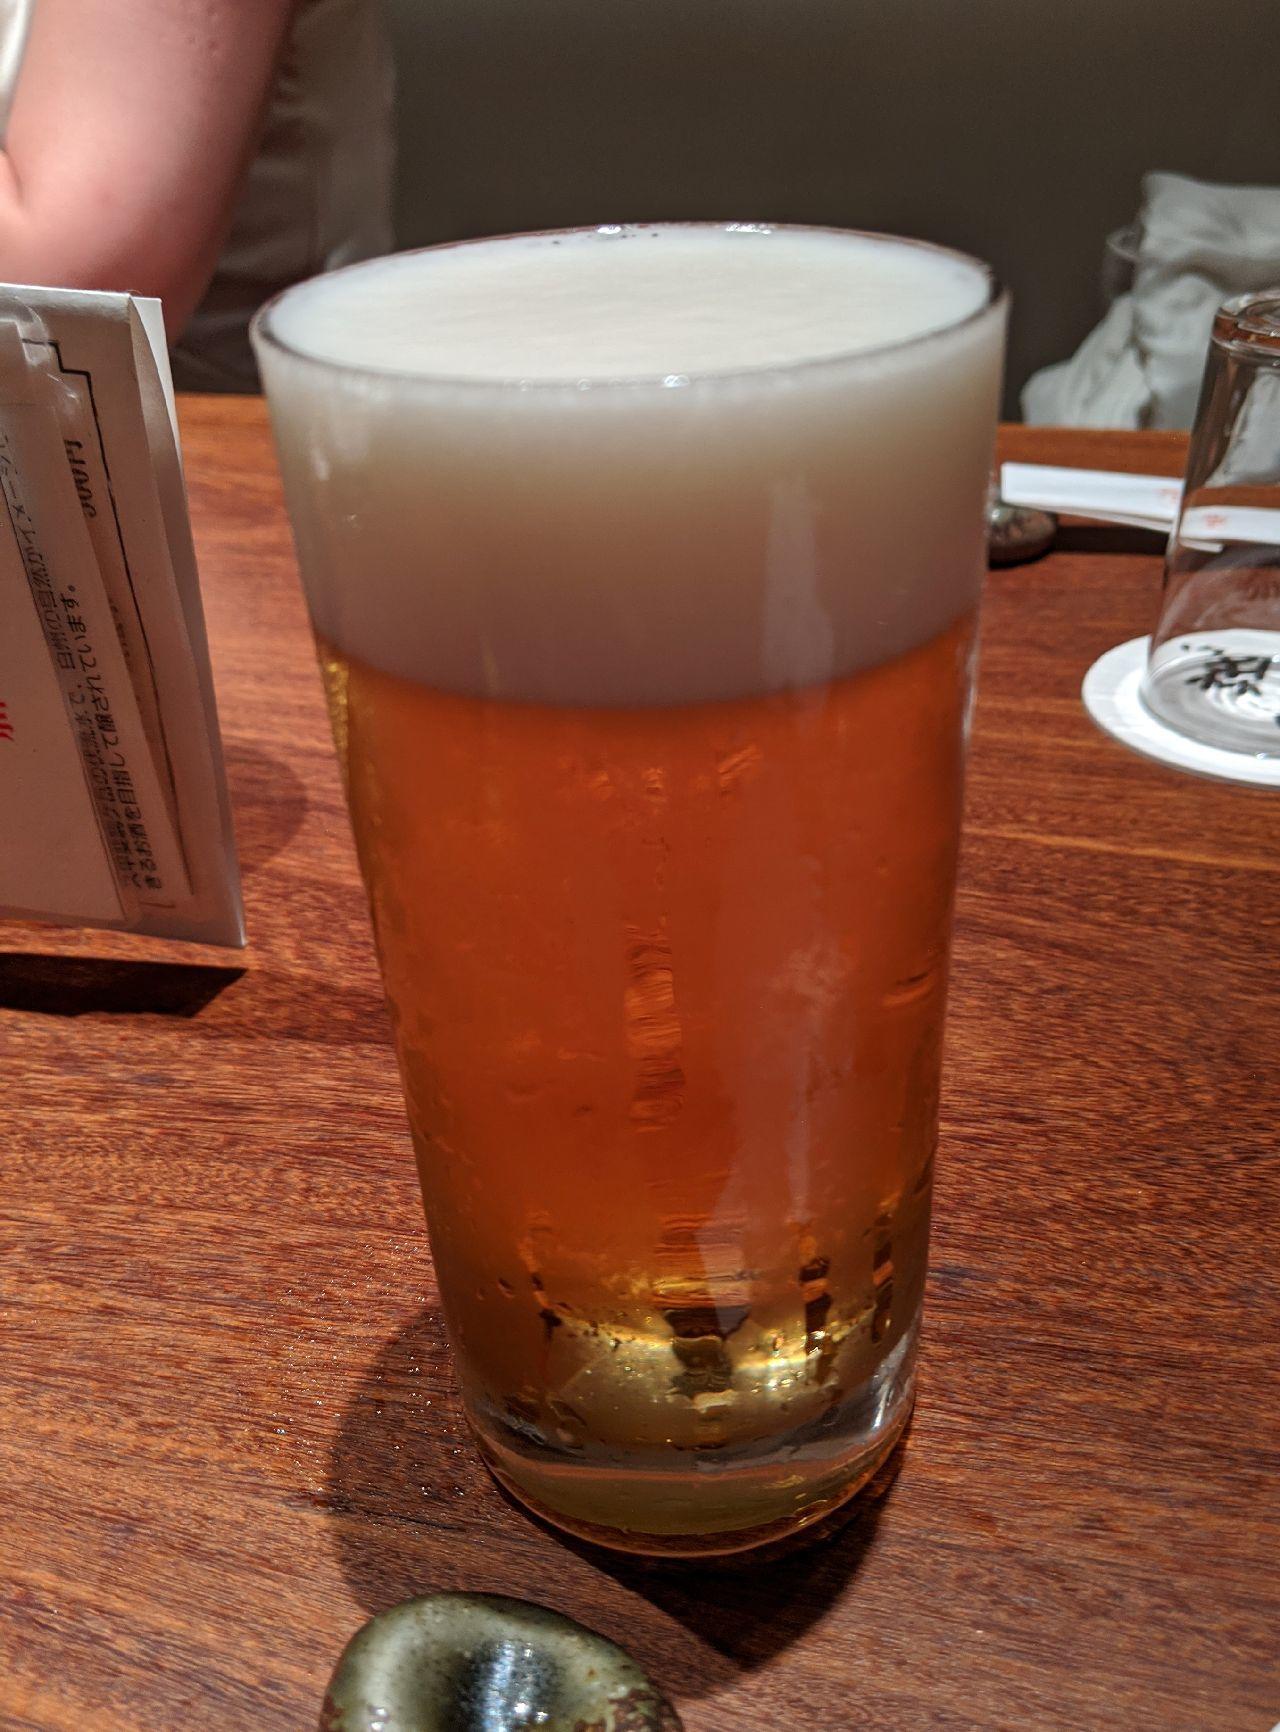 MVIMG_20200821_192531_1生ビール